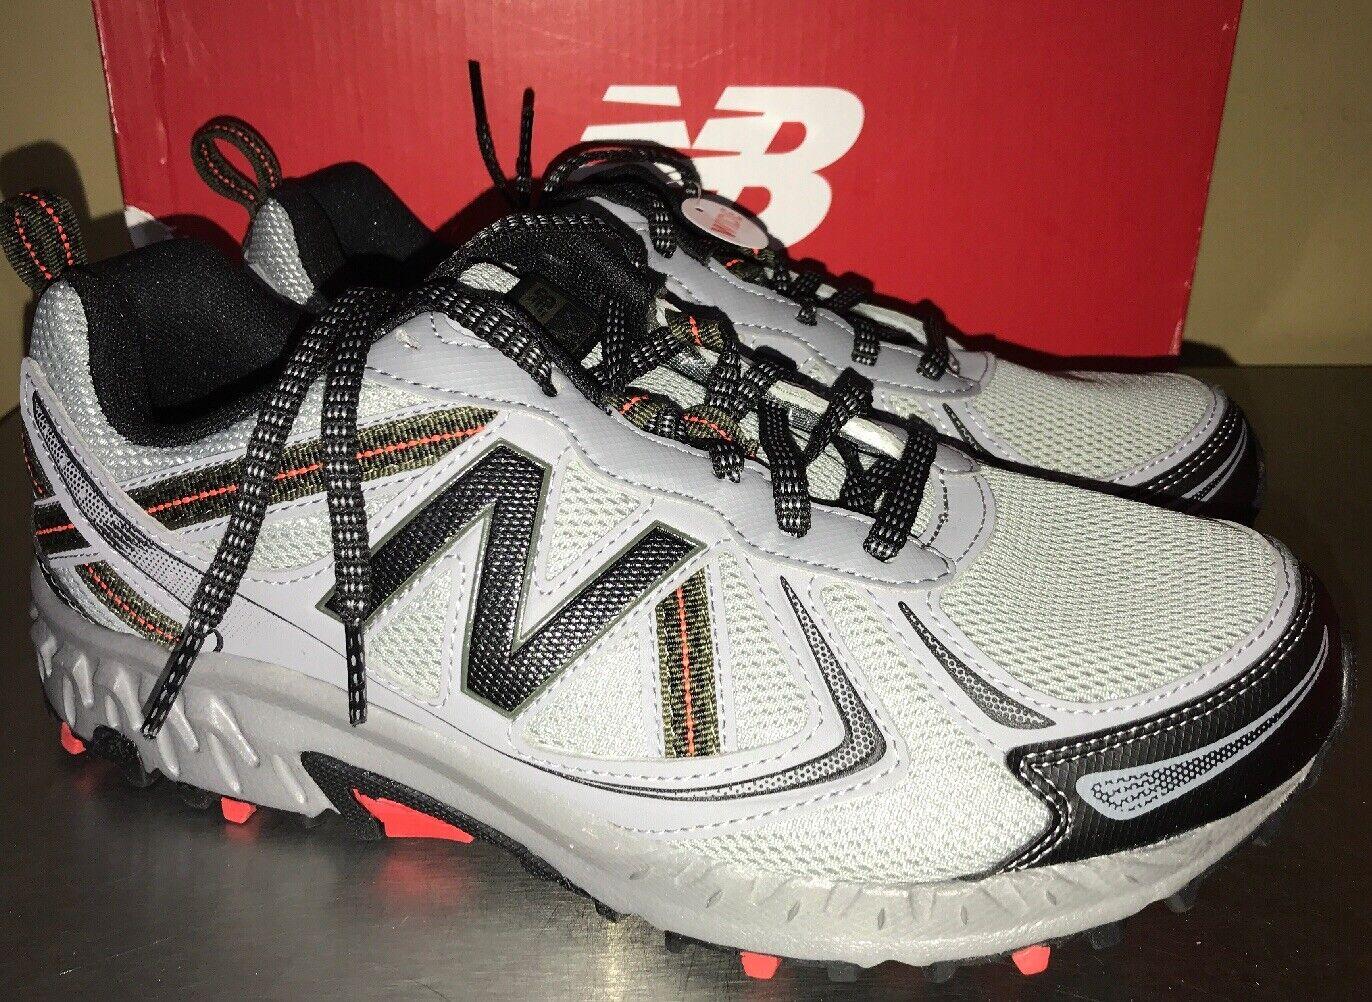 NEW BALANCE Trail shoes Men Sz 12 4E WIDE Running Sneakers MT410CS5 NEW